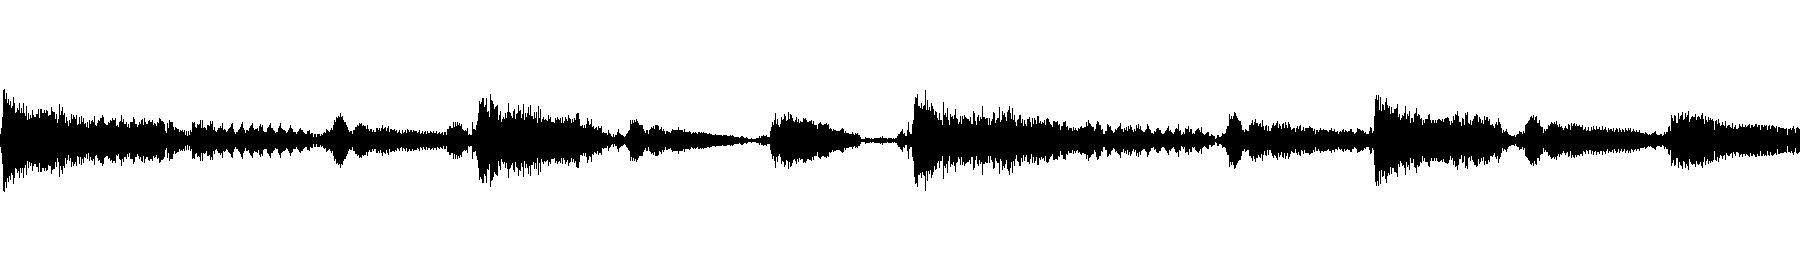 fl bluesguitar acoustic licks 78bpm f 27